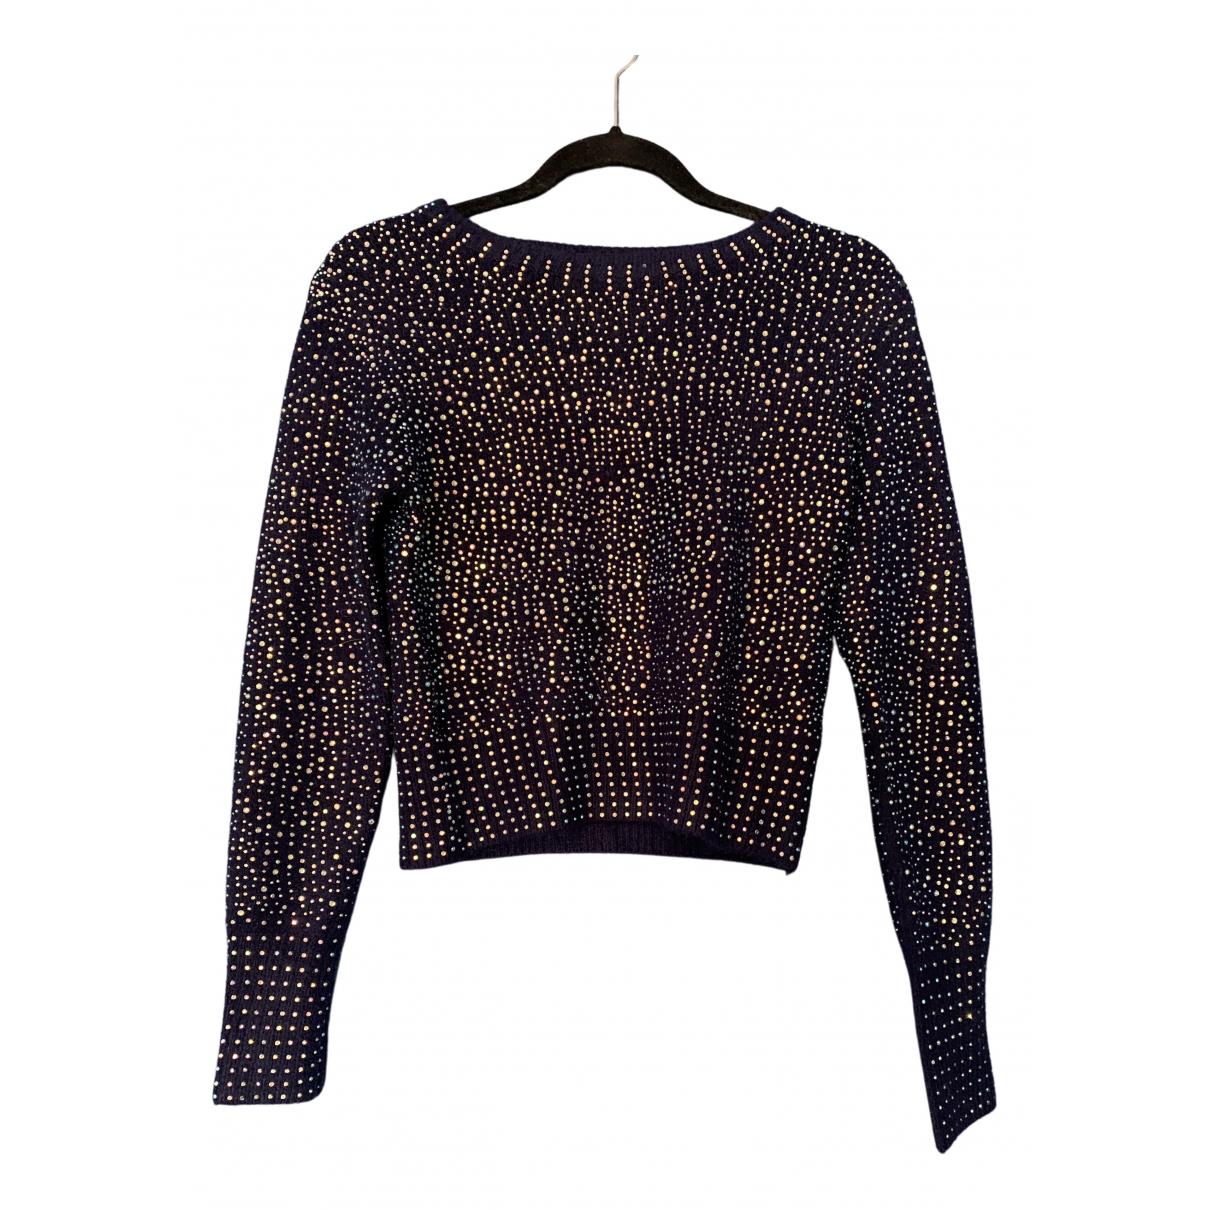 Zara \N Pullover in  Blau Synthetik